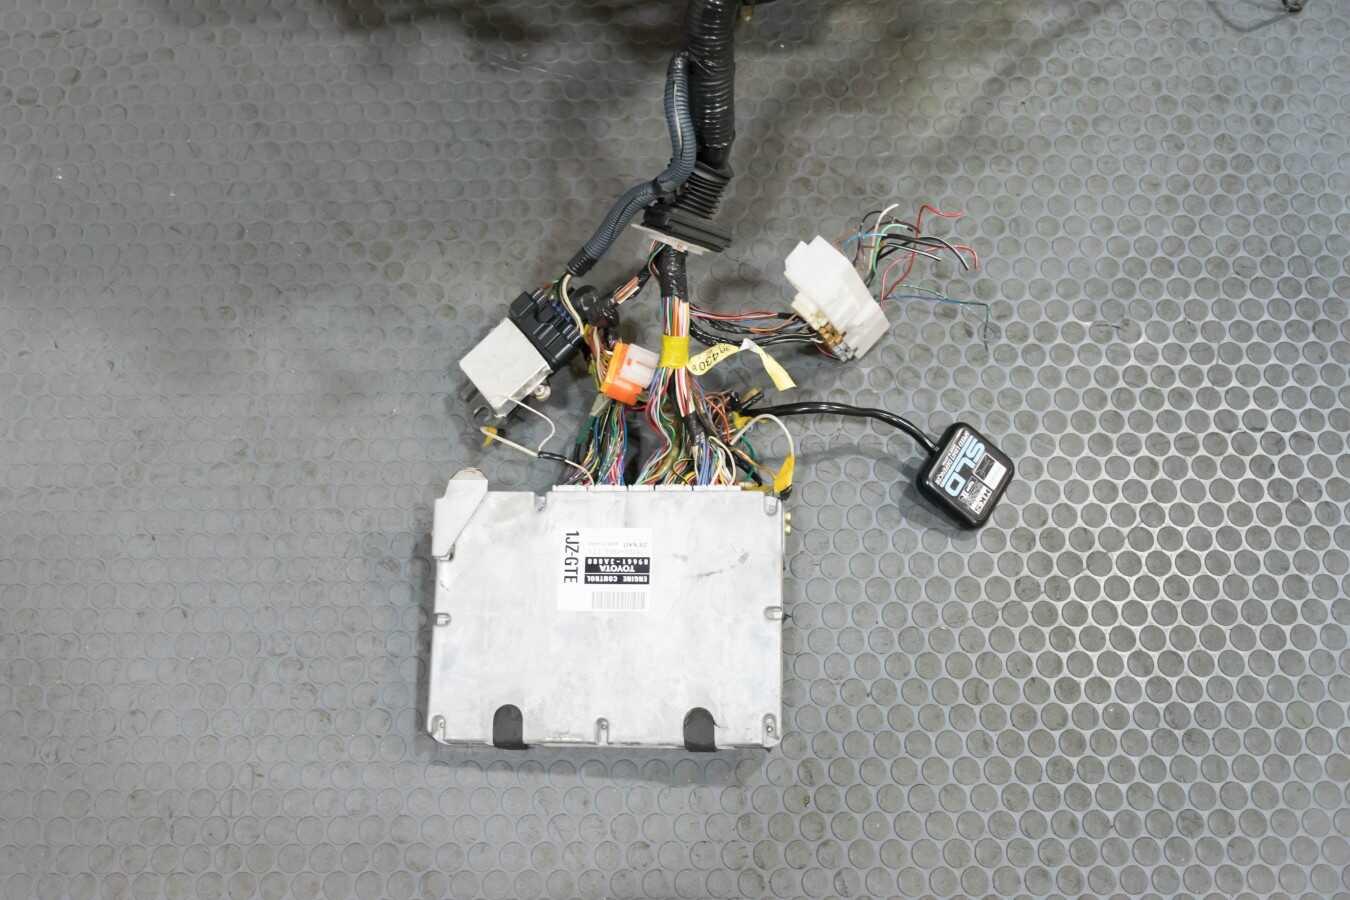 1jz Vvti Complete Swap With Ecu Transmission Wiring Harness 1jzgte 1191 Dsc 0246